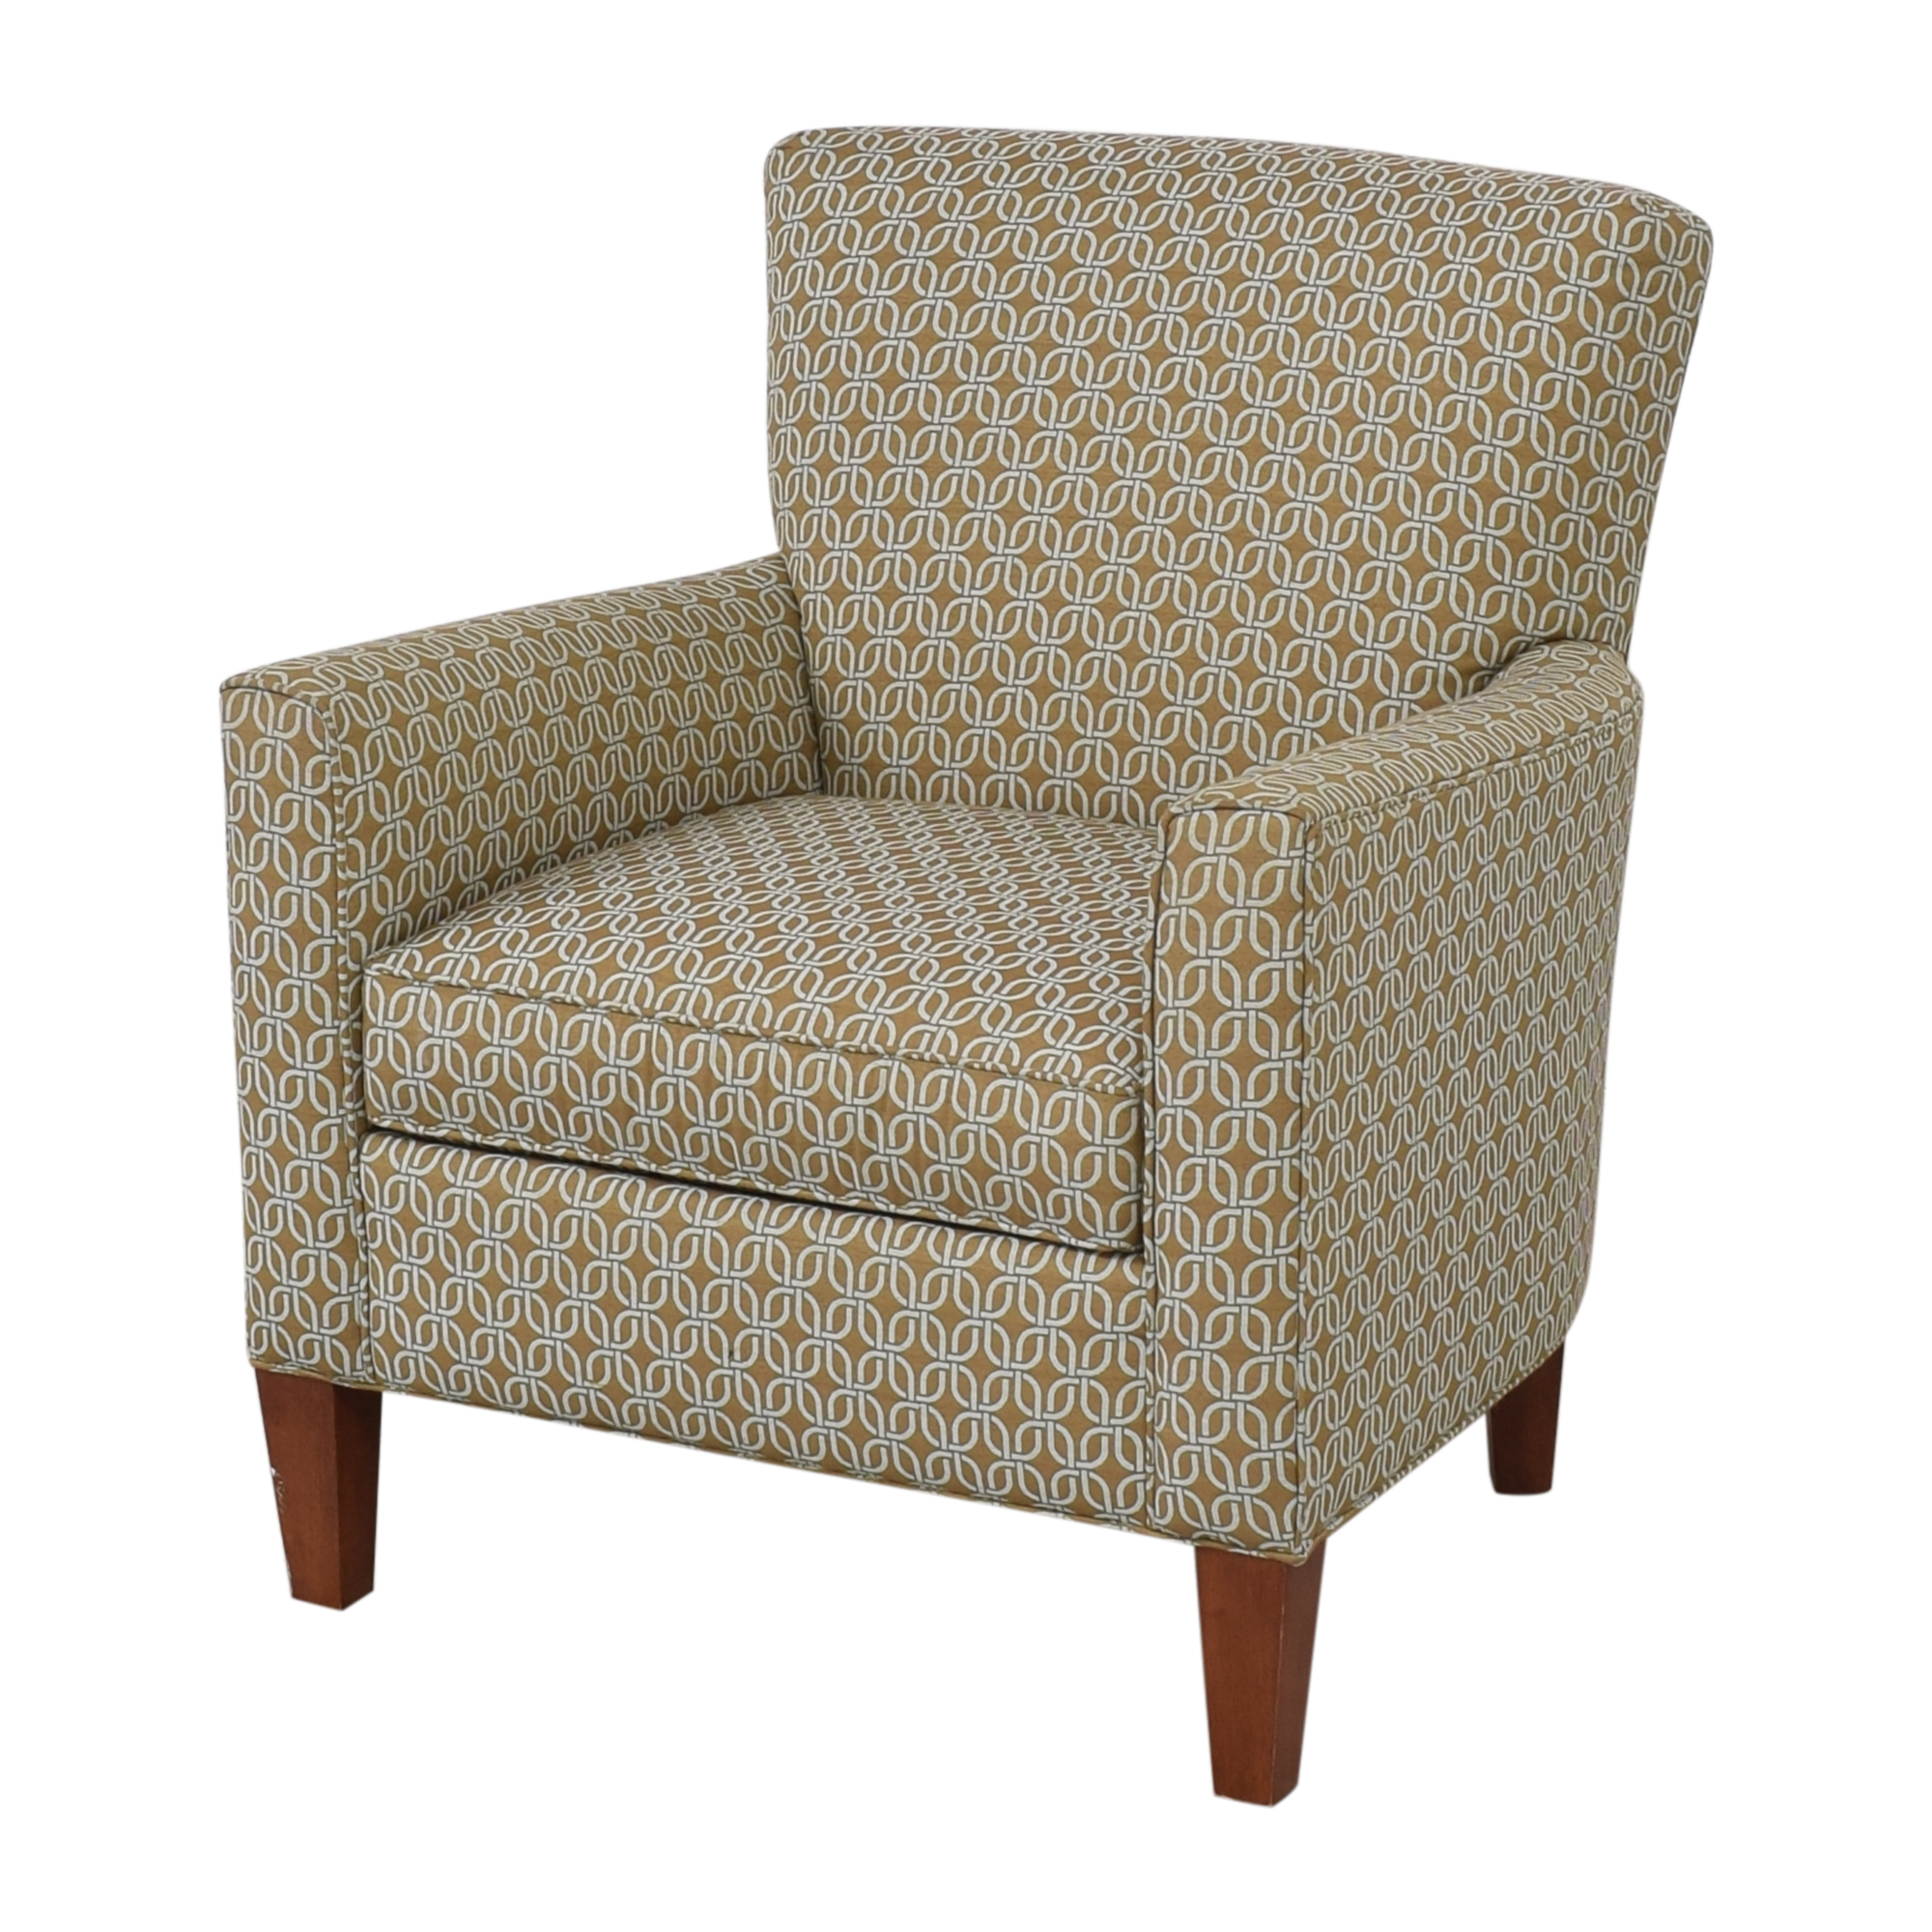 Ethan Allen Ethan Allen Custom Collin Chair on sale